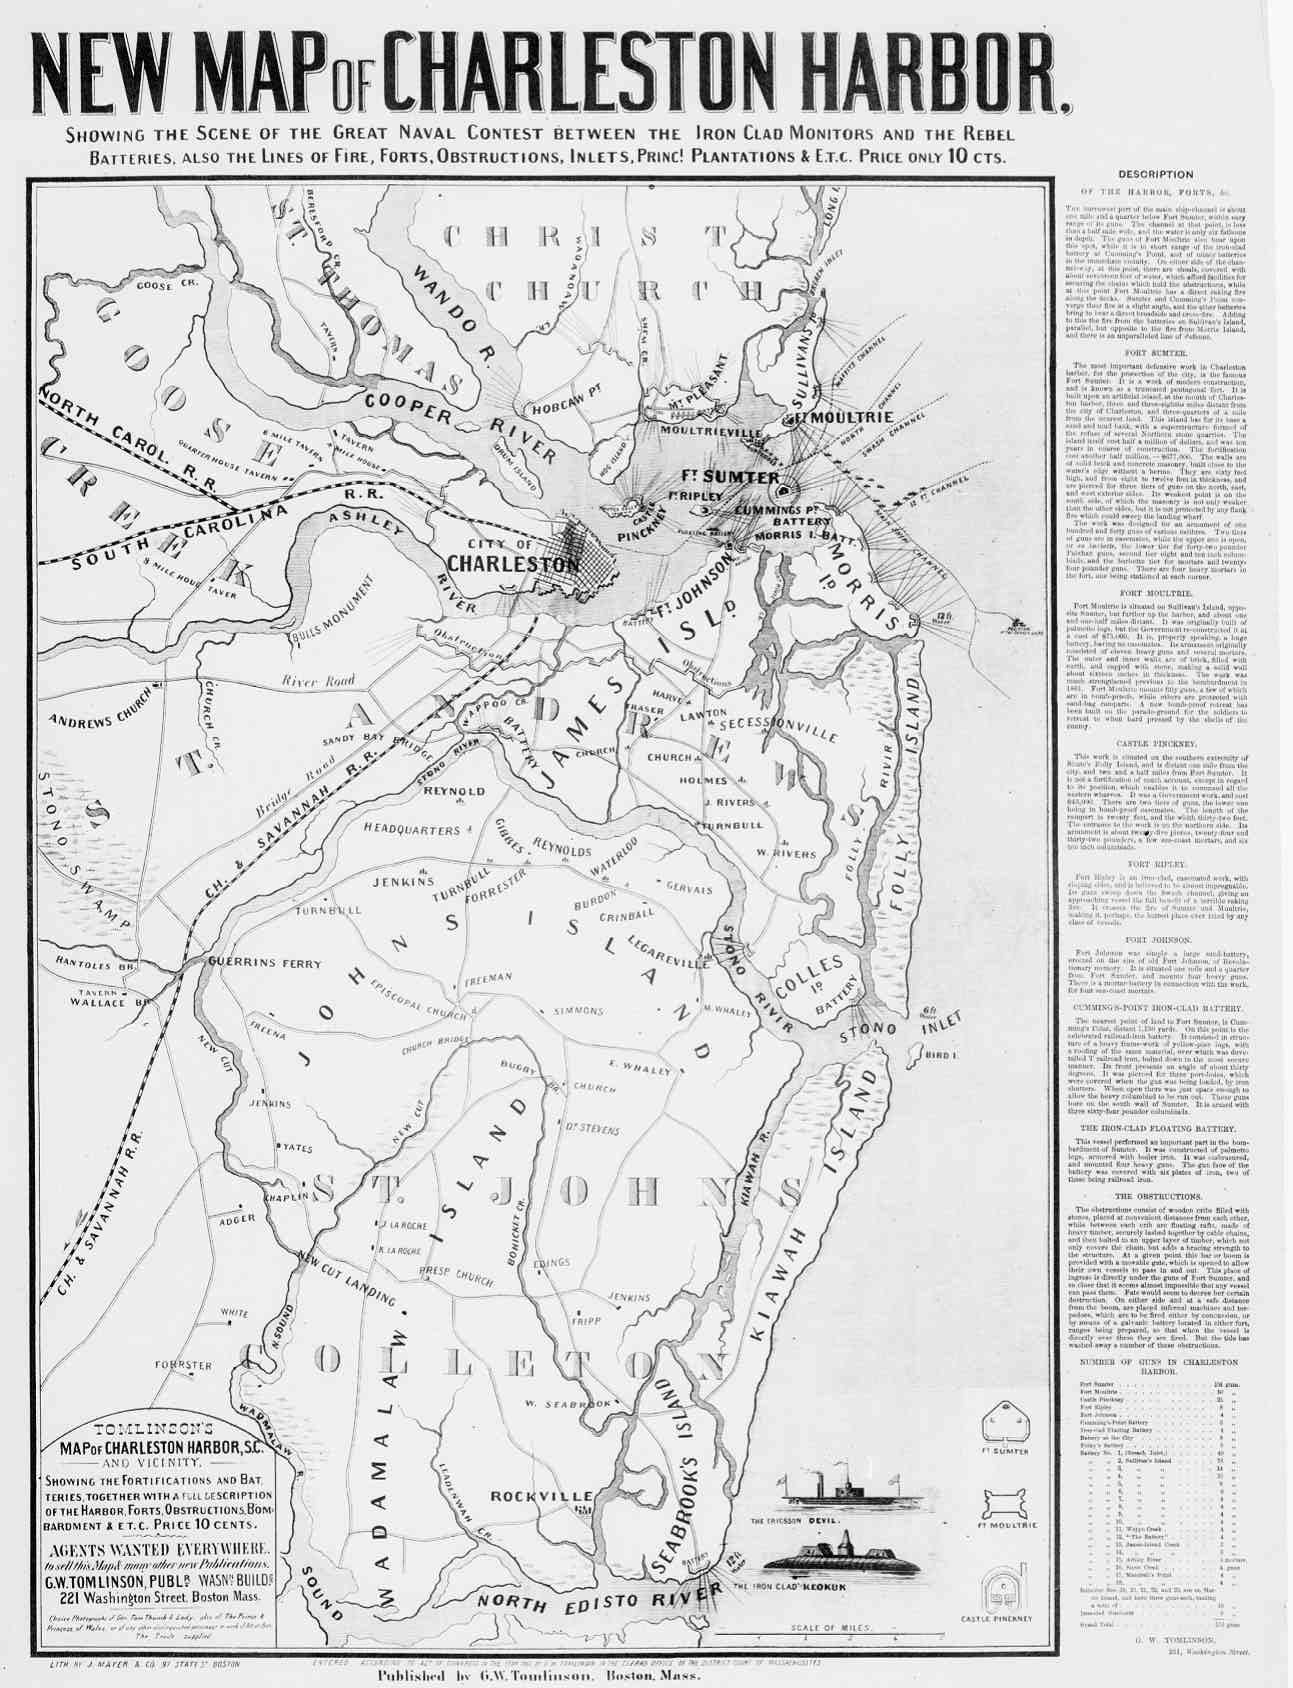 Fort Sumter On Us Map.1861 1865 Civil War Battle Maps Of Charleston Sc Fort Sumter